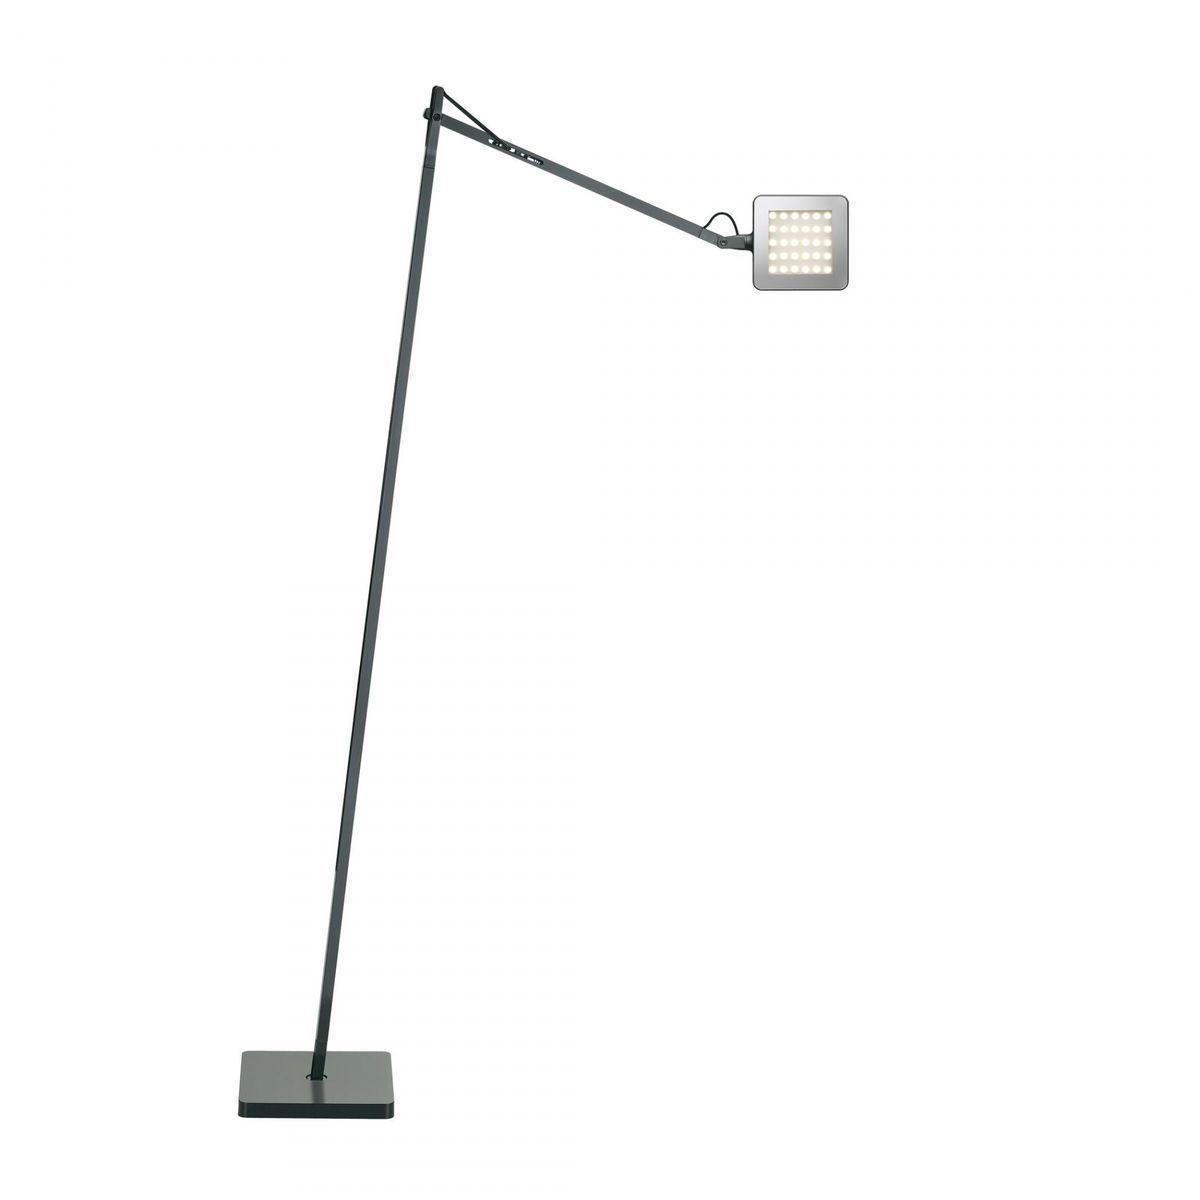 kelvin led f floor lamp flos standing lamps lighting. Black Bedroom Furniture Sets. Home Design Ideas